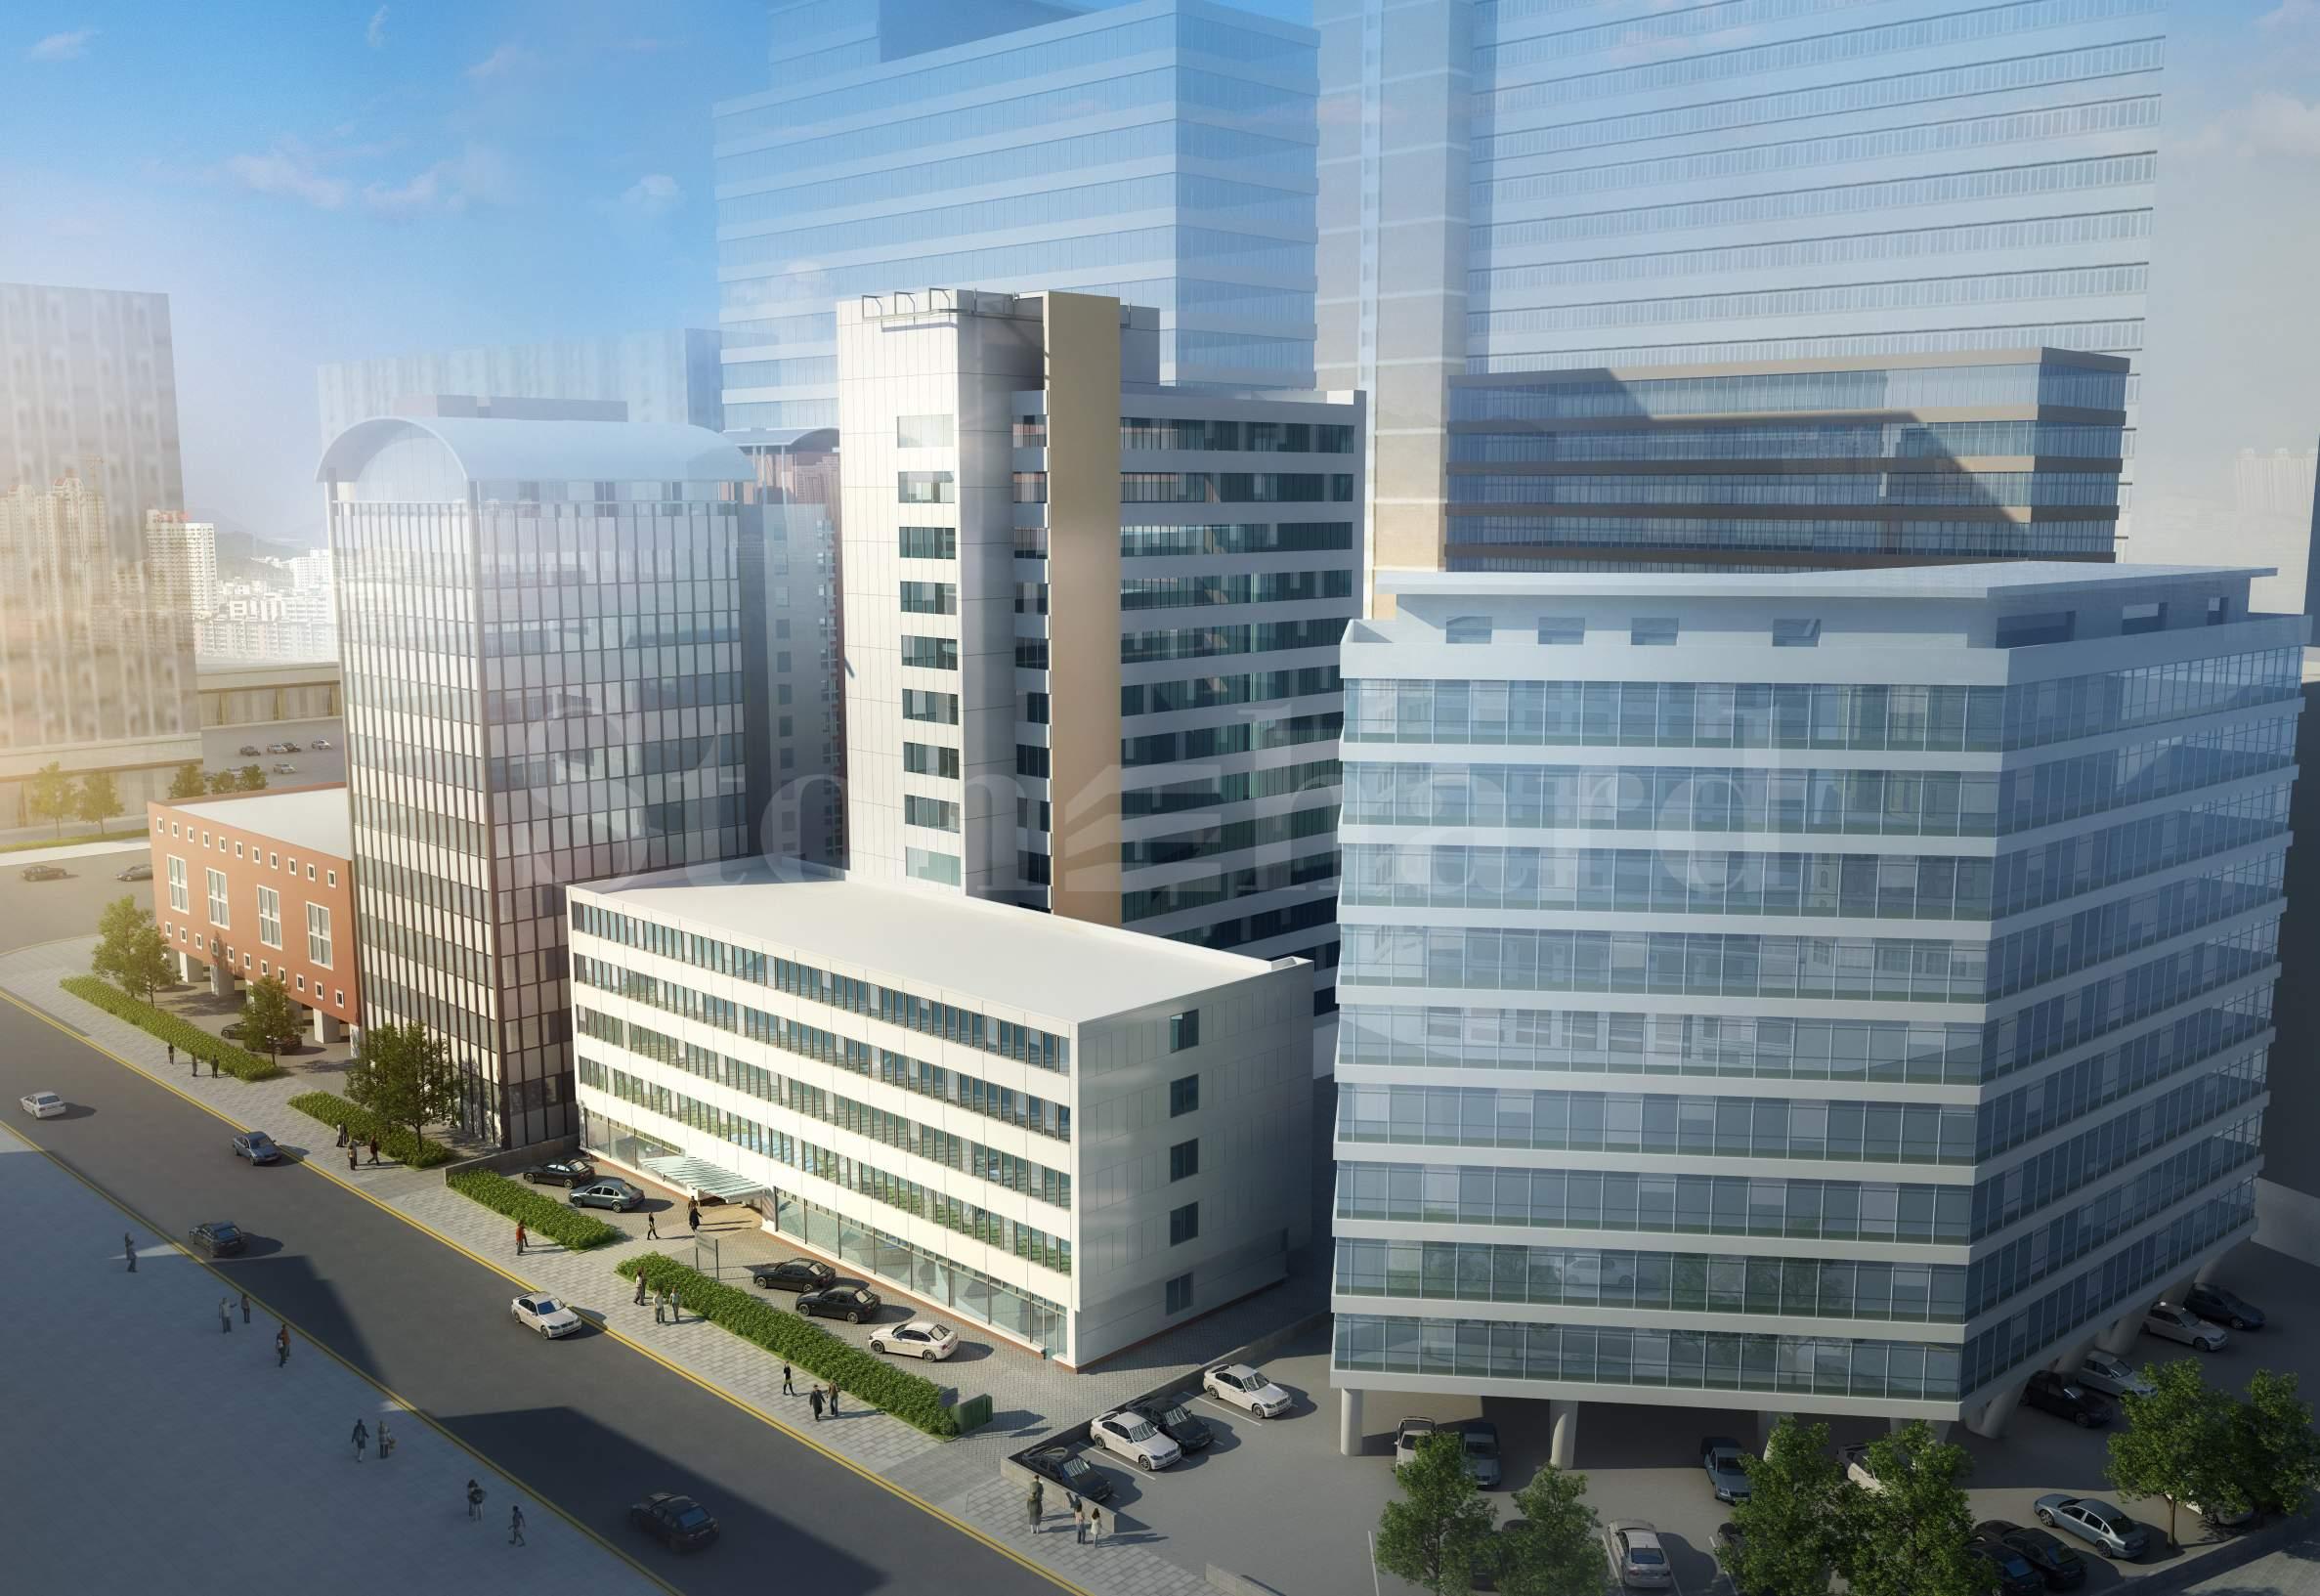 New big development in the heart of Croydon2 - Stonehard